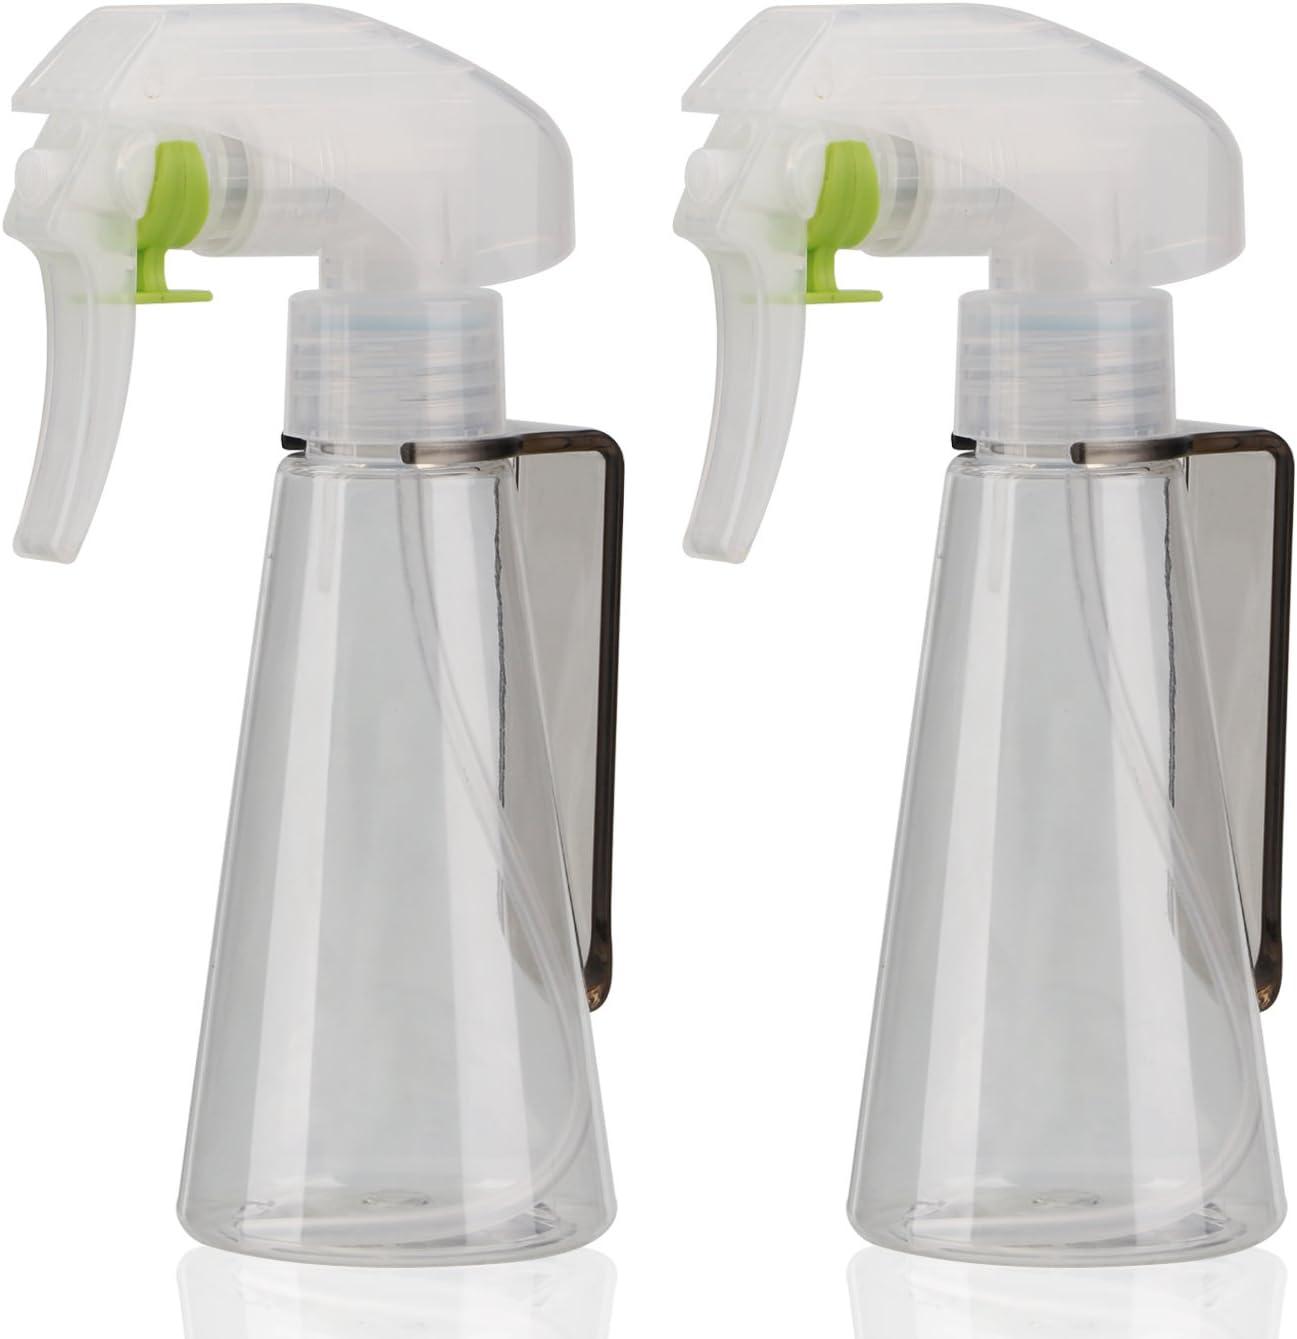 Segbeauty Plant Mister Spray Bottle, 2pcs Fine Mist Spray Bottle for Cleaning Solution Gardening Trigger Water Empty Sprayer 3.4oz 100ml(Clear)